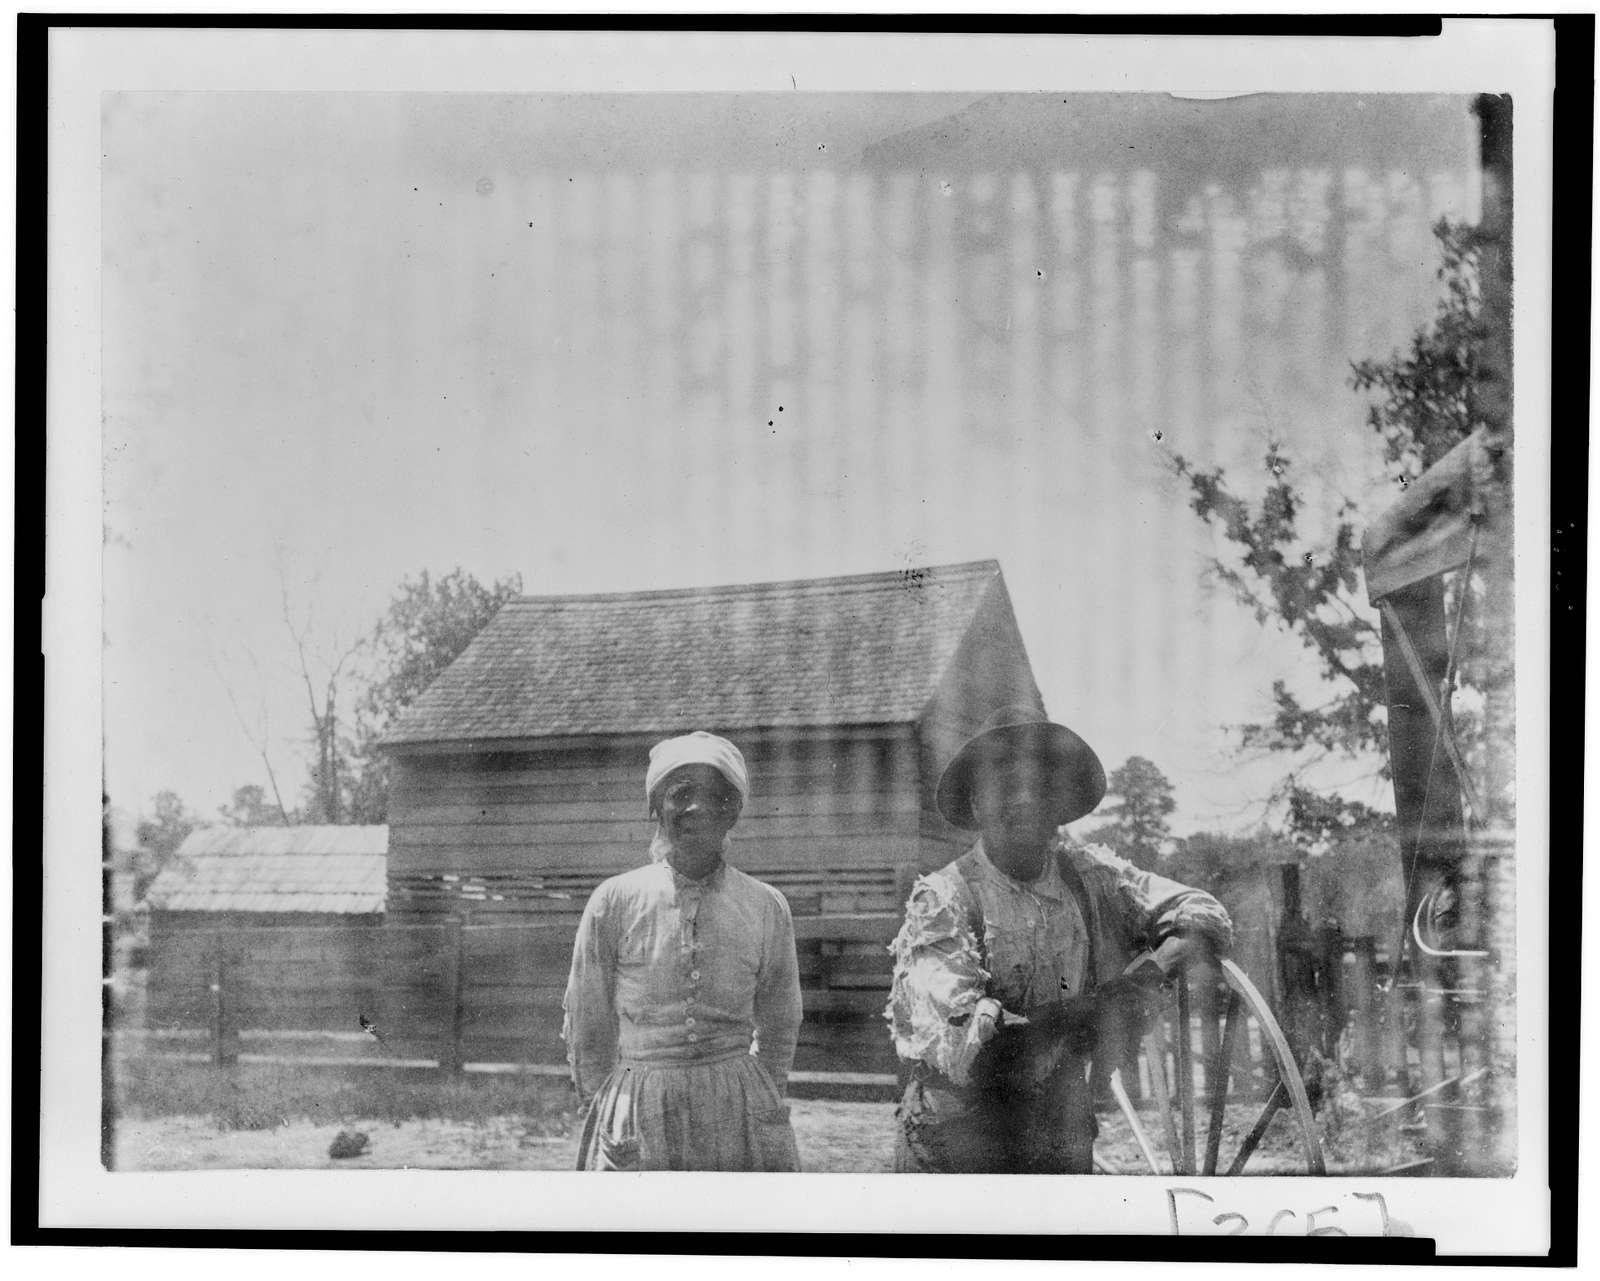 [African American man and woman, half-length portrait, standing in barnyard(?)]